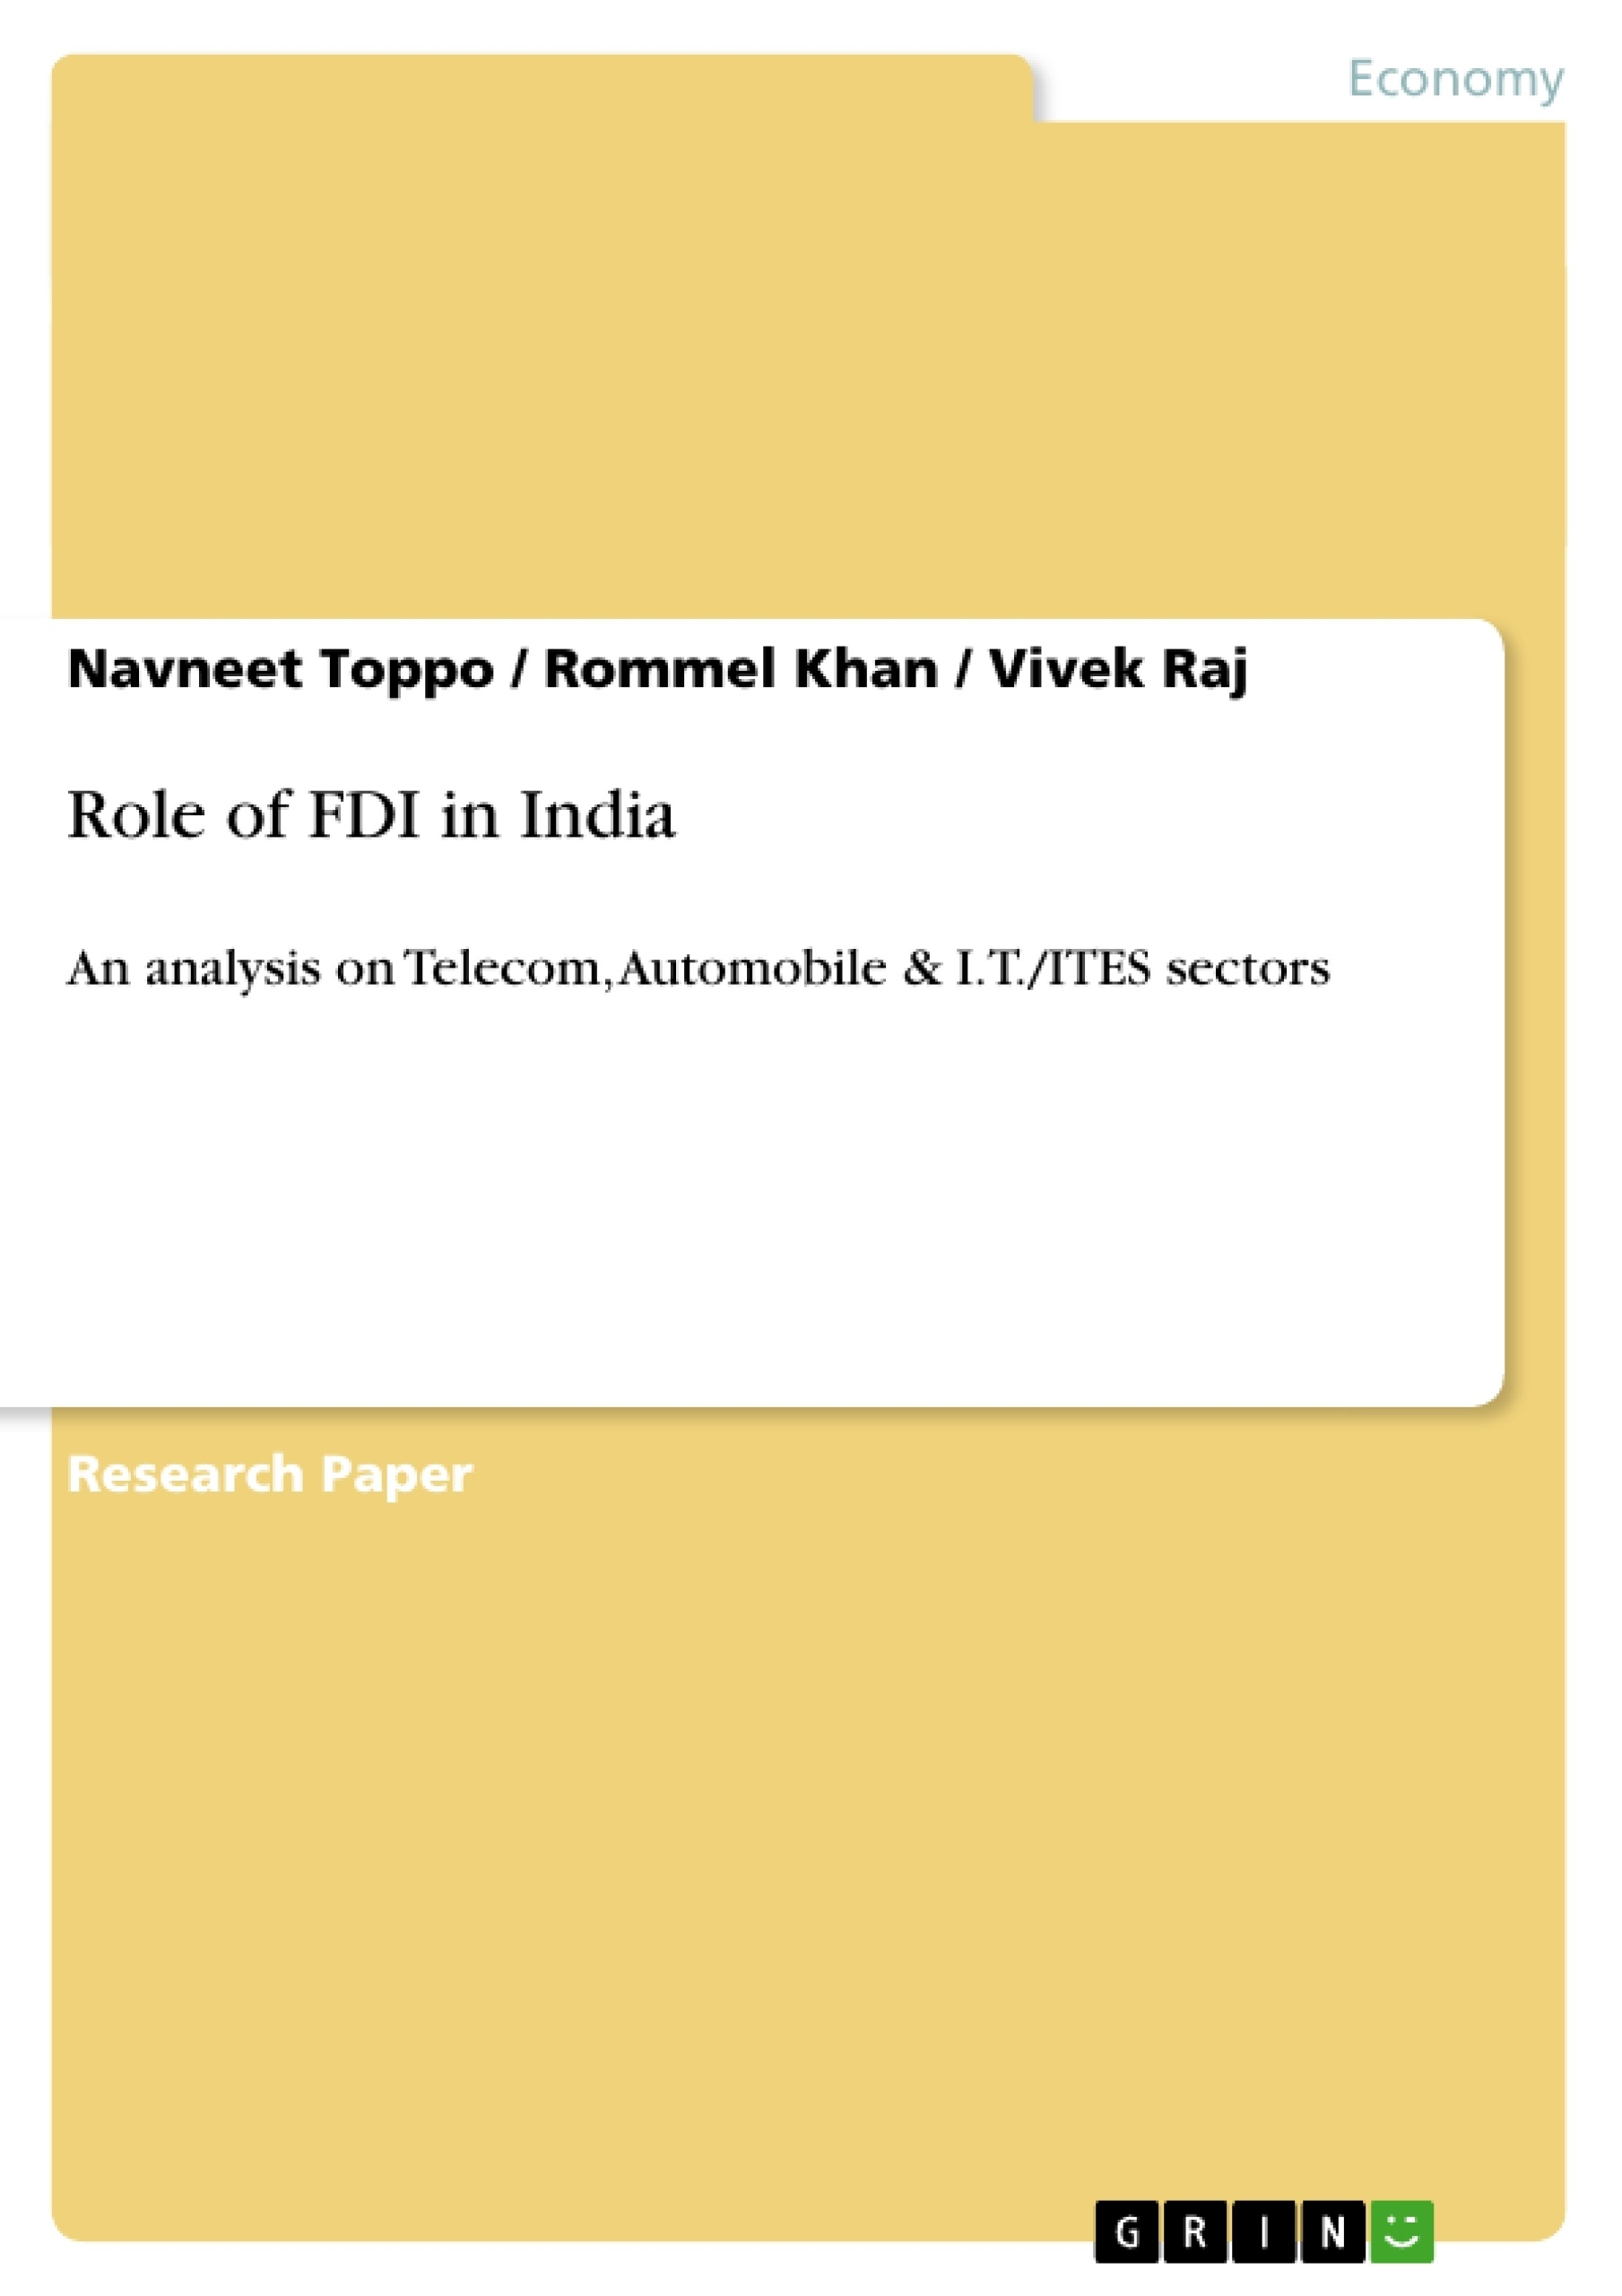 Title: Role of FDI in India